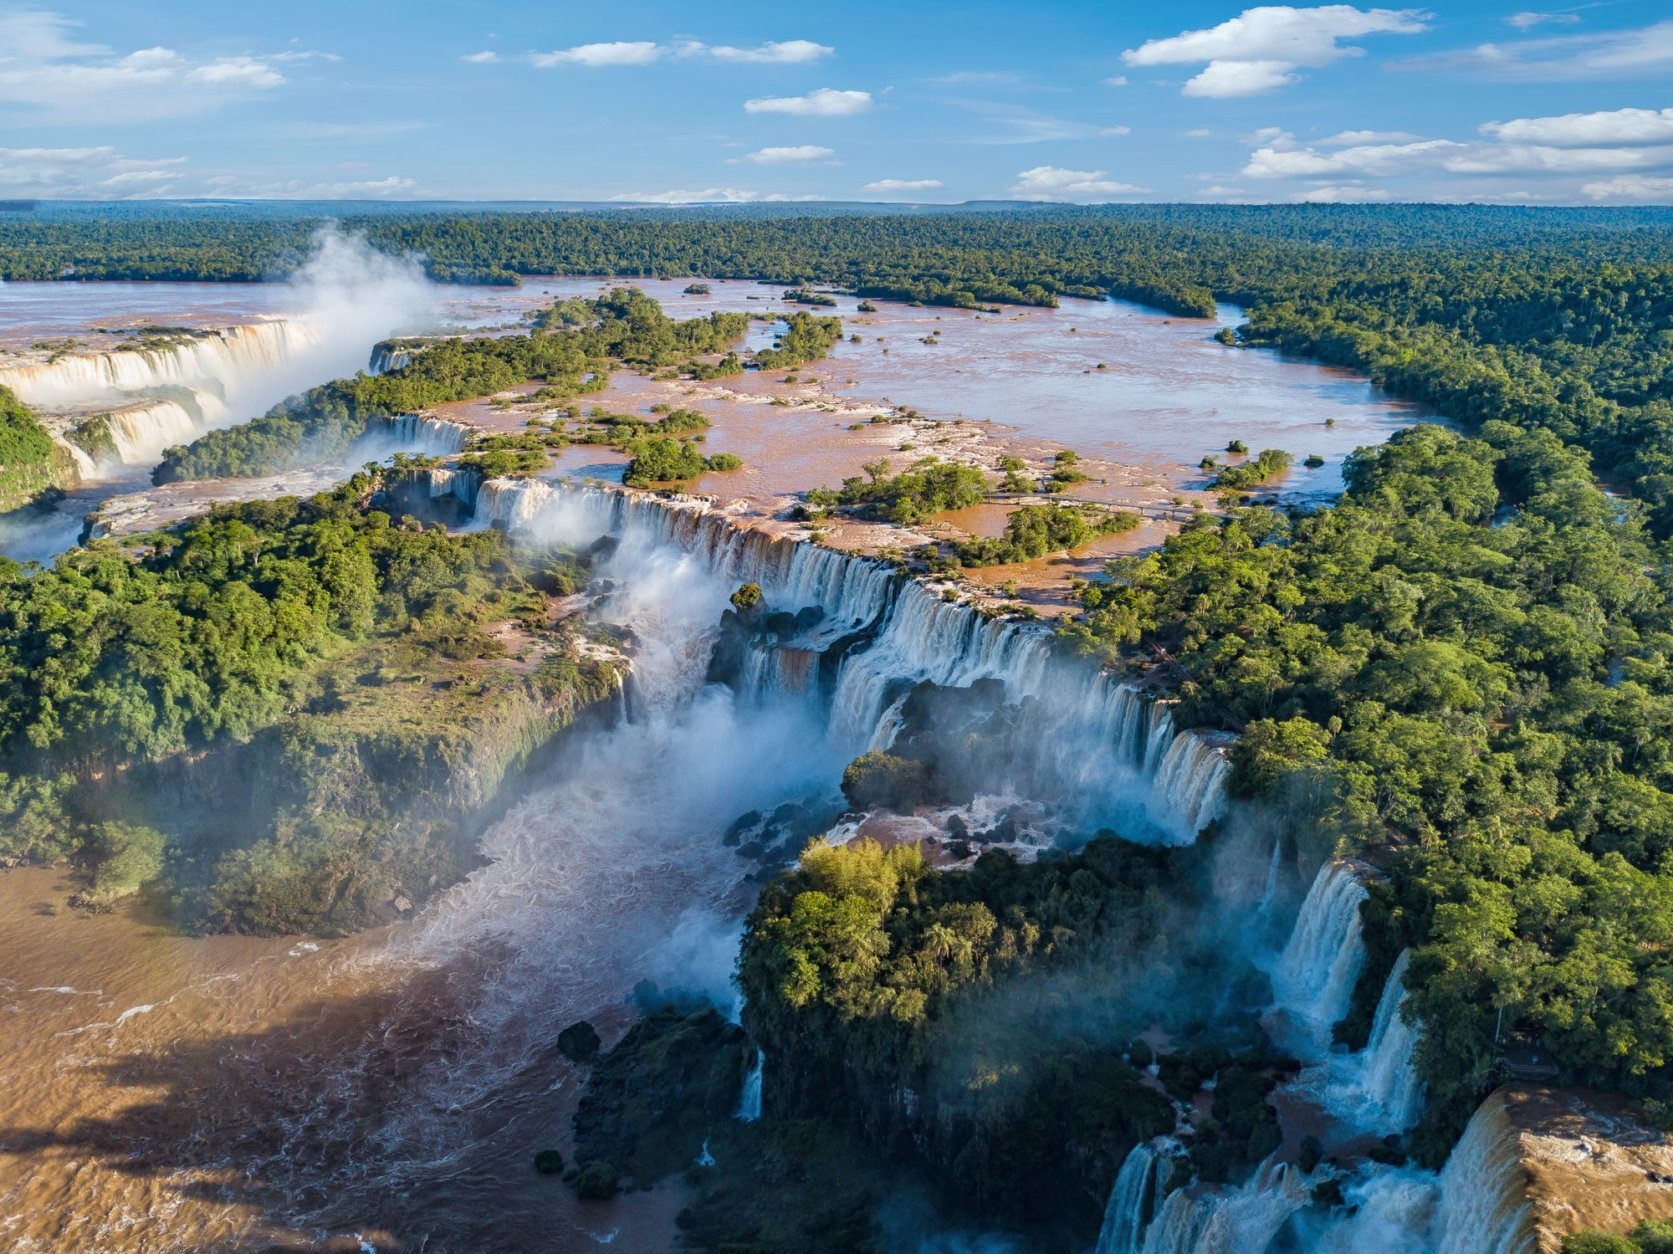 Aerial view of the Iguazu Falls. View over the Garganta del Diablo the Devil's Throat.